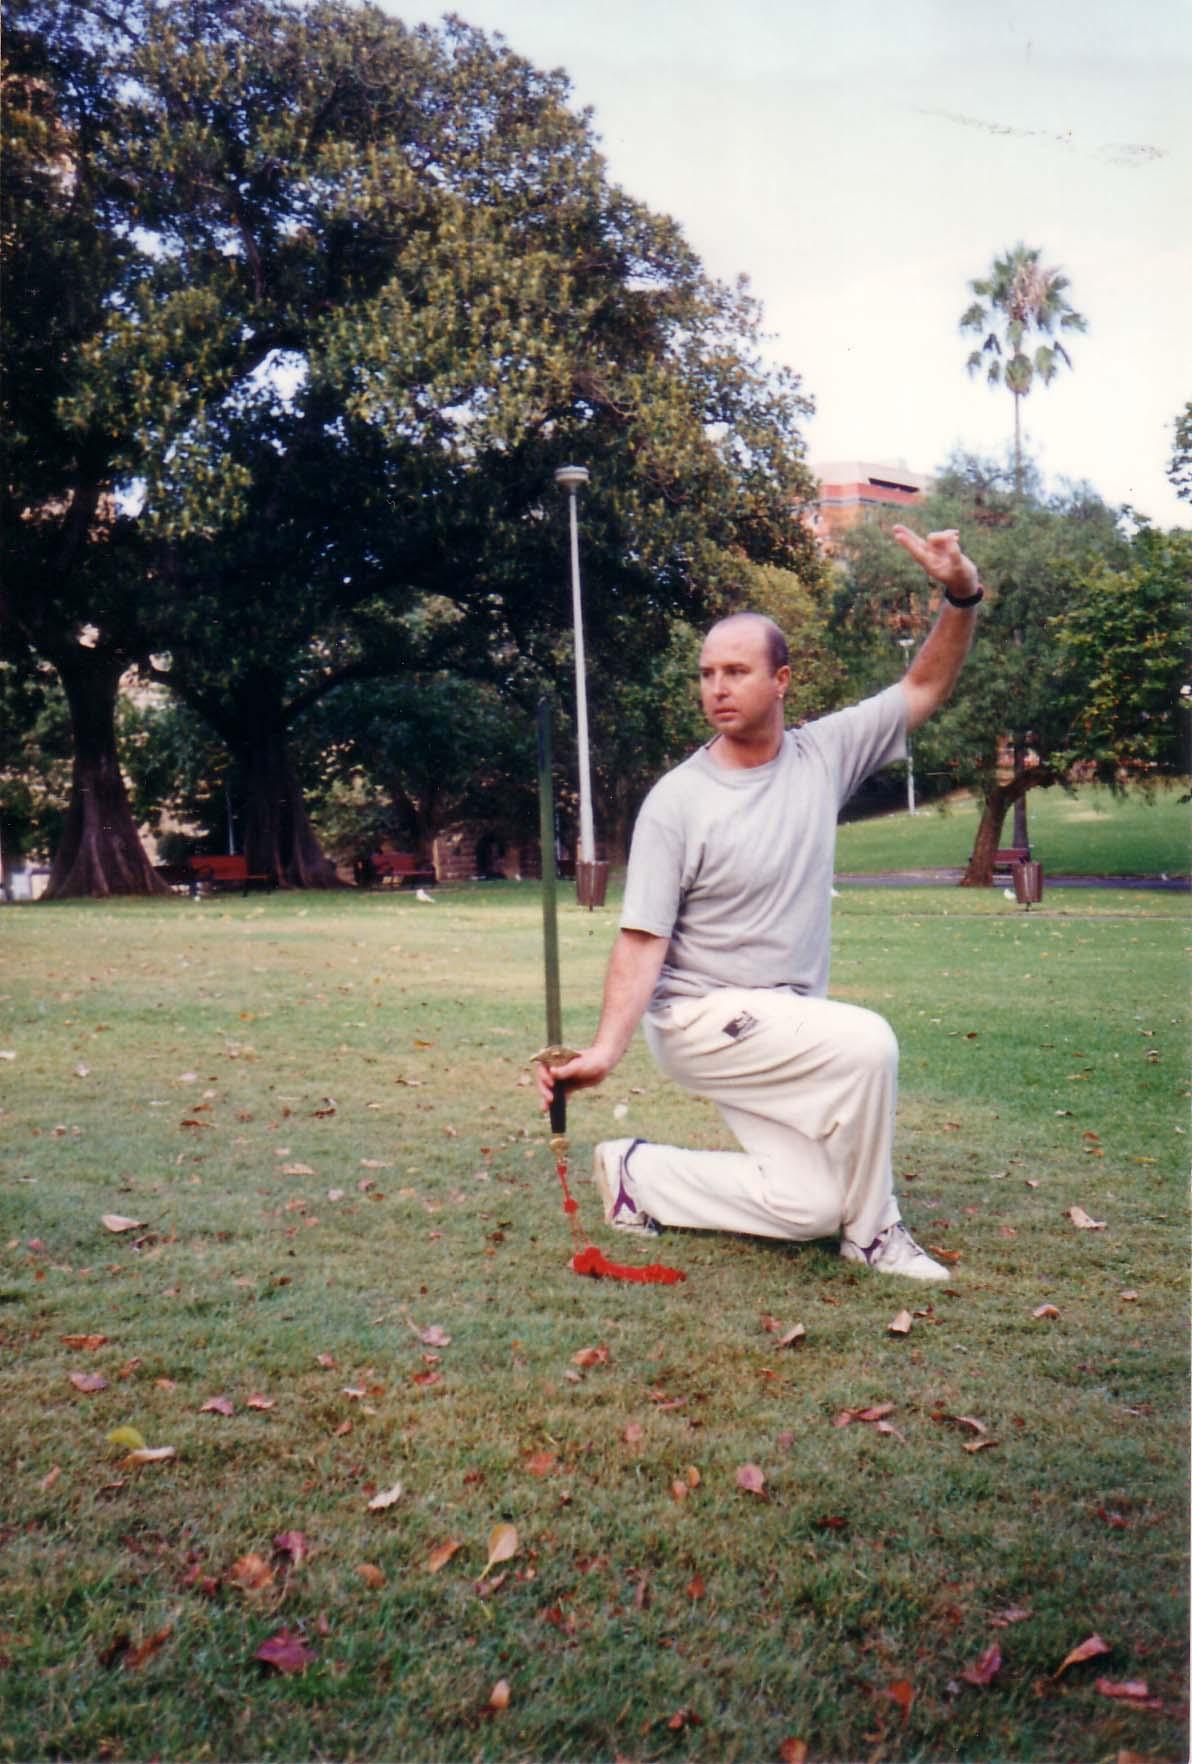 Simon-Blow-Taijiquan-sword-1996-simonblowqigong.com